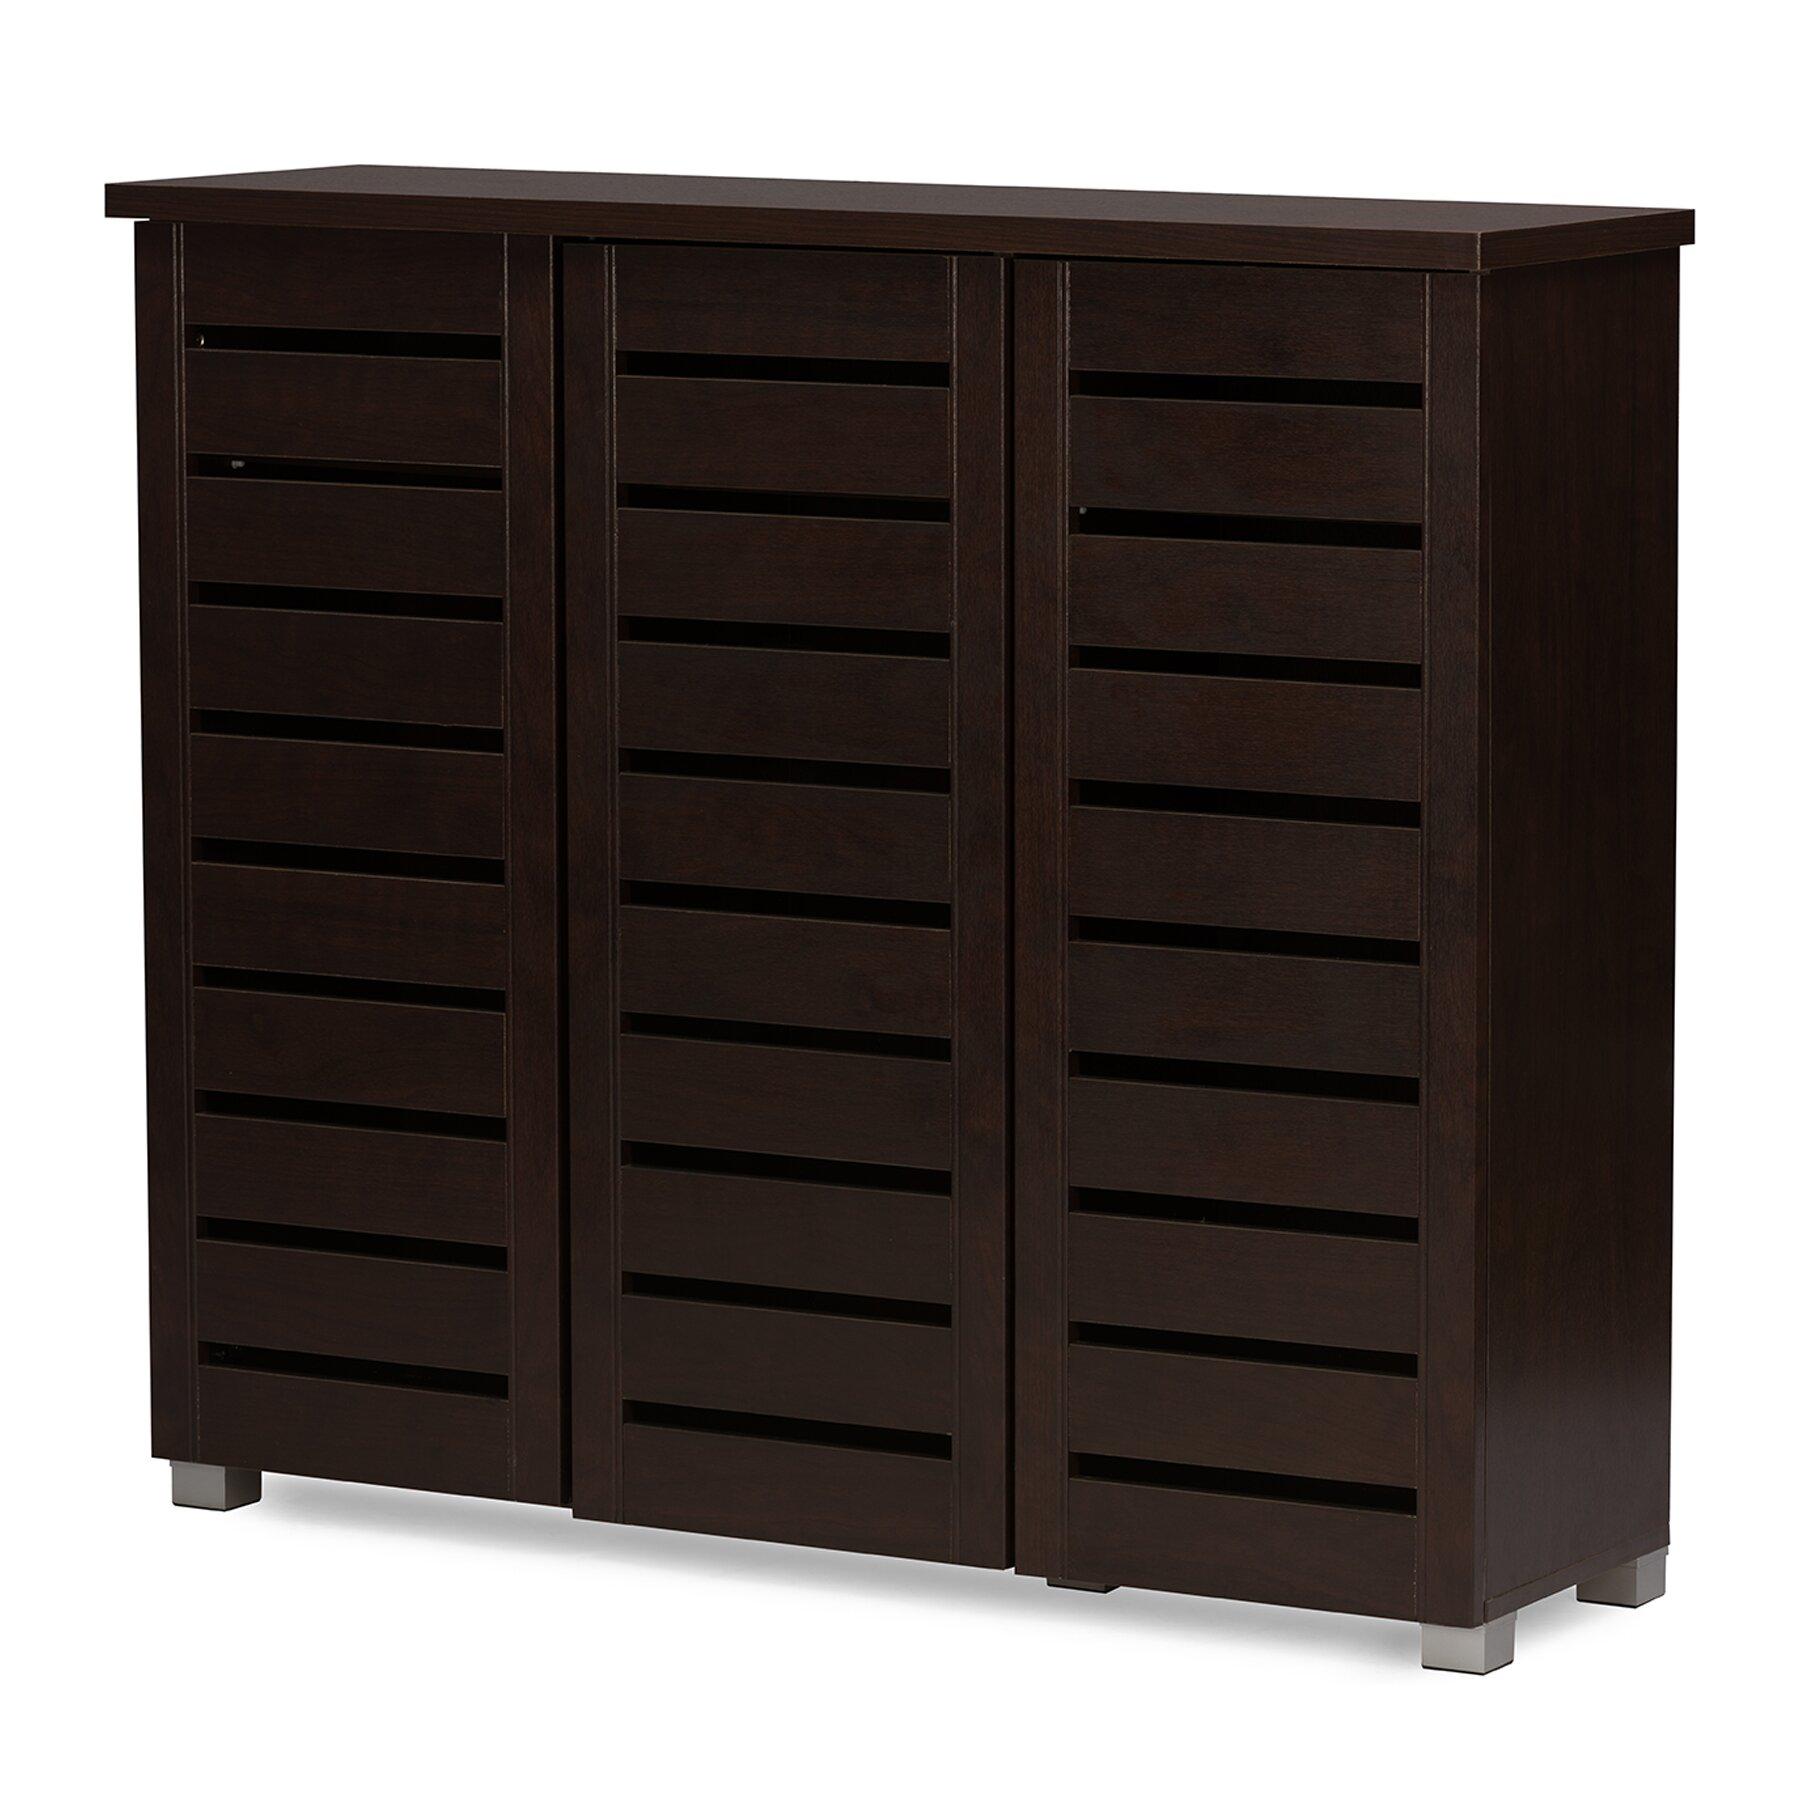 Contemporary Foyer Cabinets : Baxton studio adalwin modern and contemporary door dark